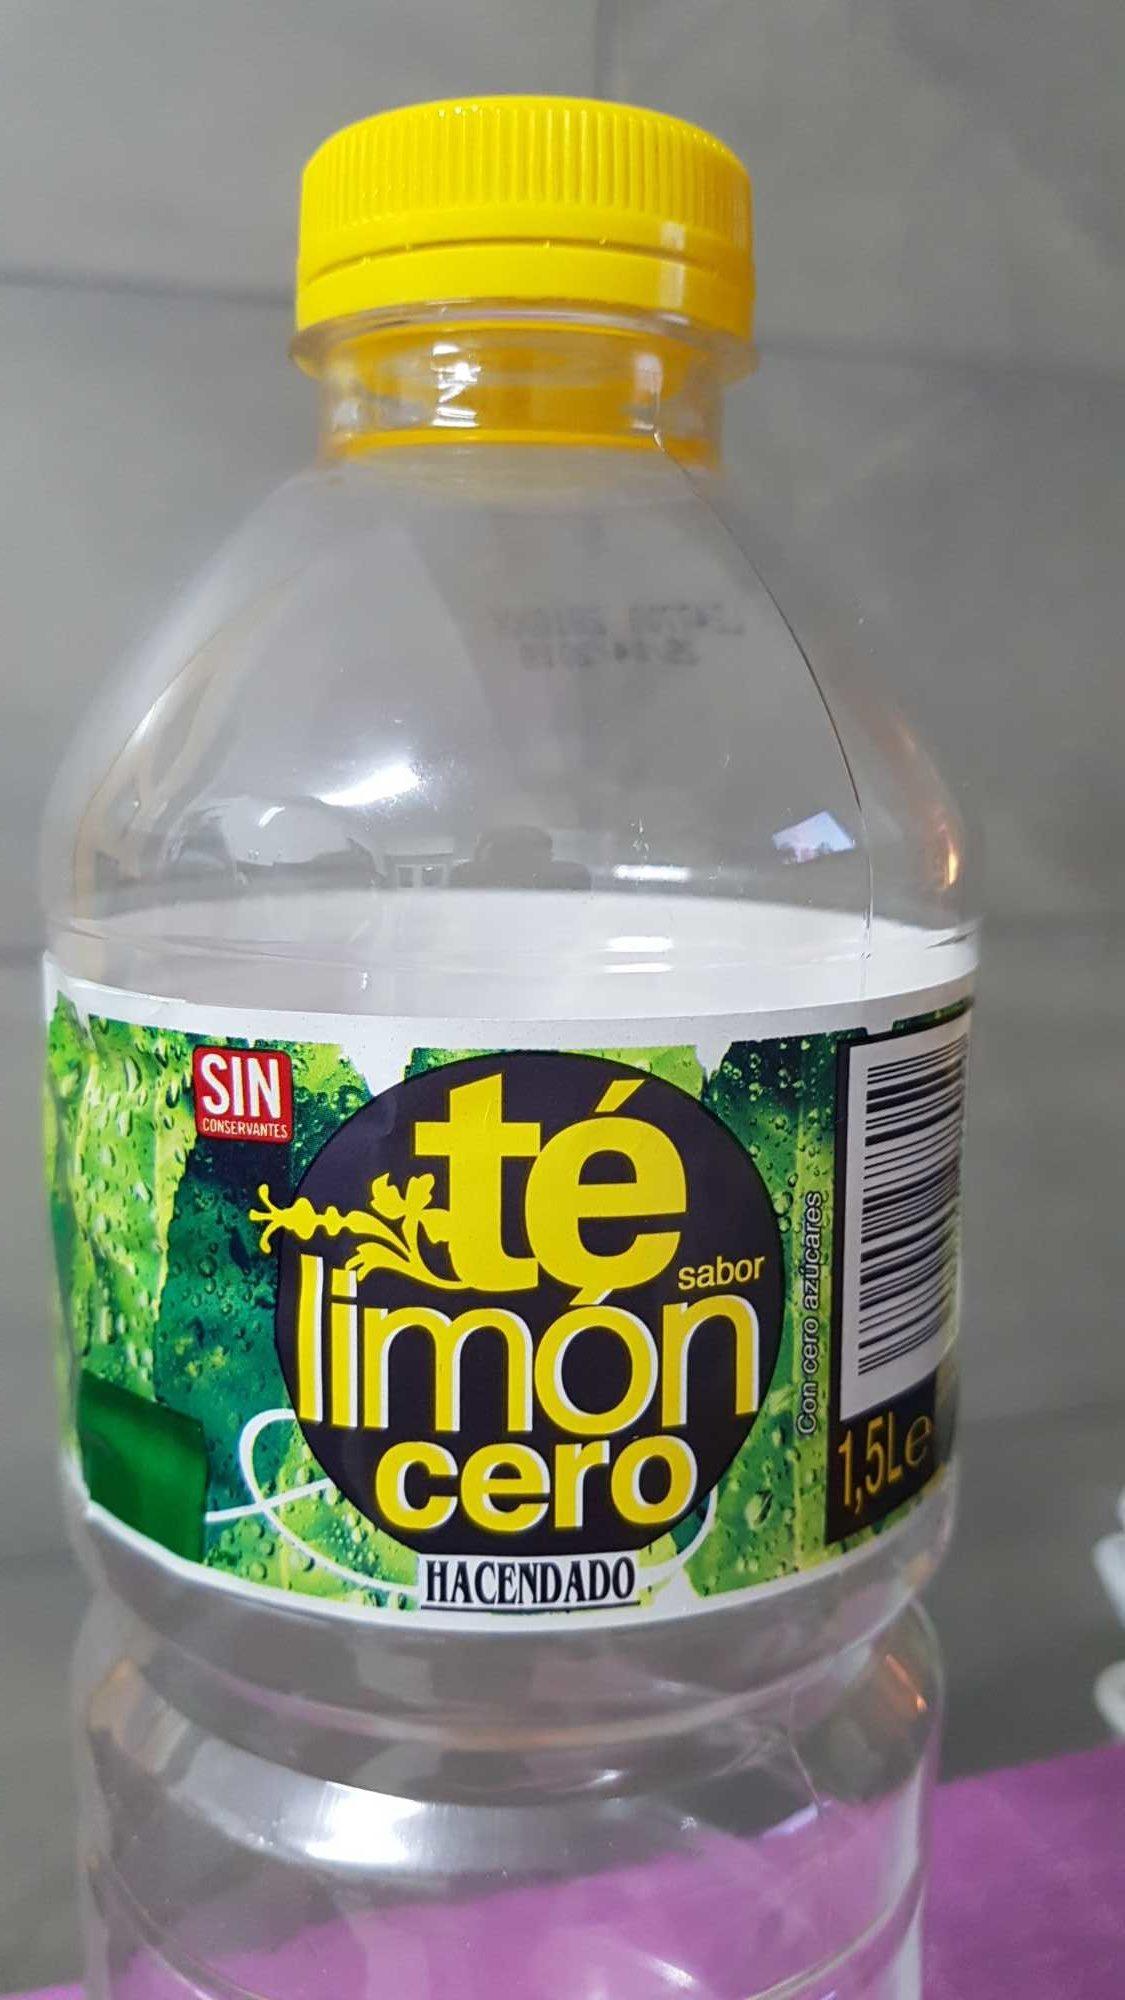 Té limón cero - Producto - es